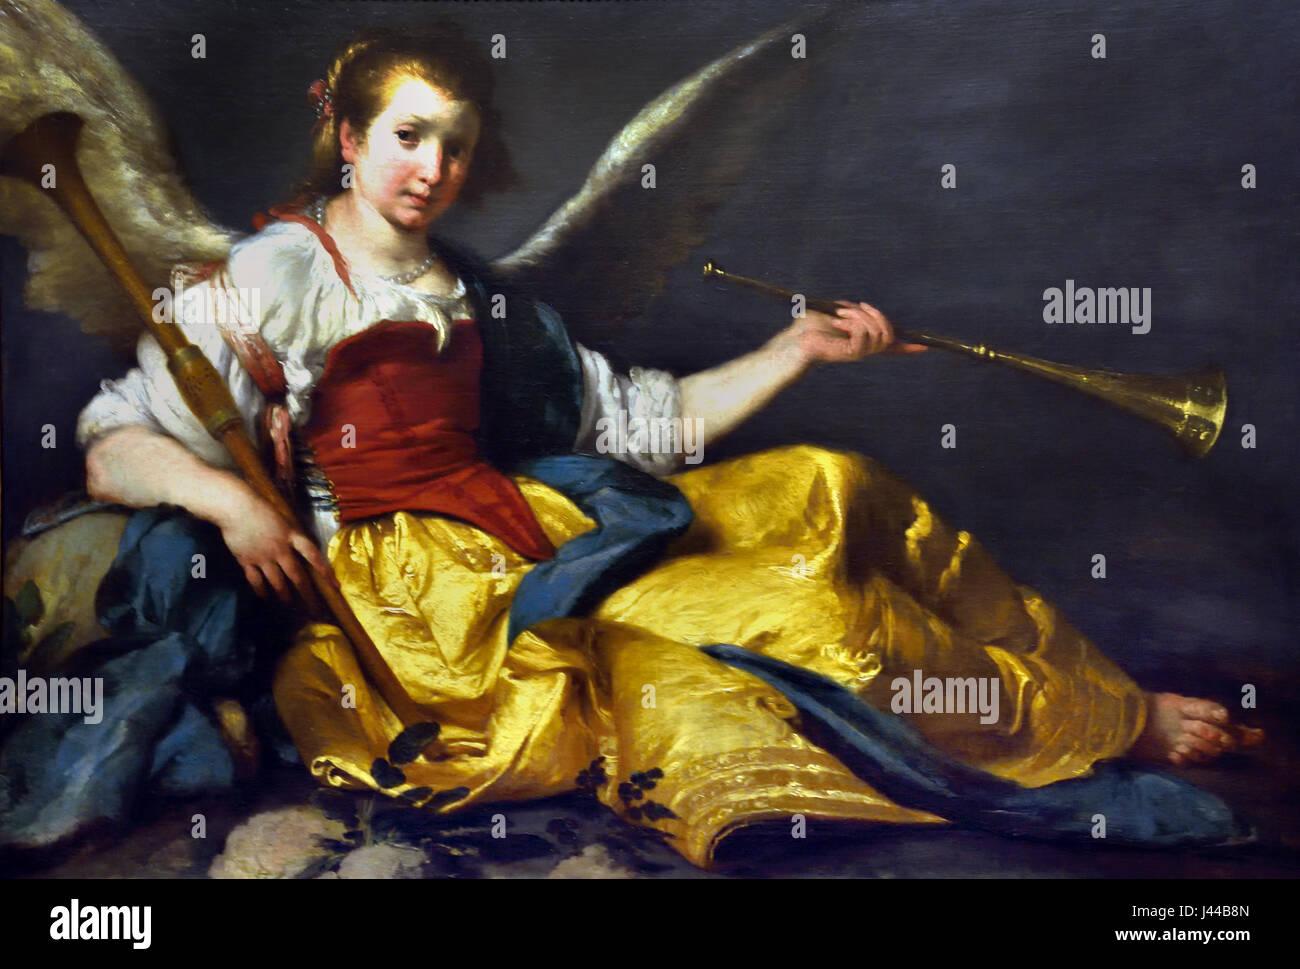 A Personification of Fame 1635 Bernardo Strozzi 1581 - 1644 Italy Italian - Stock Image